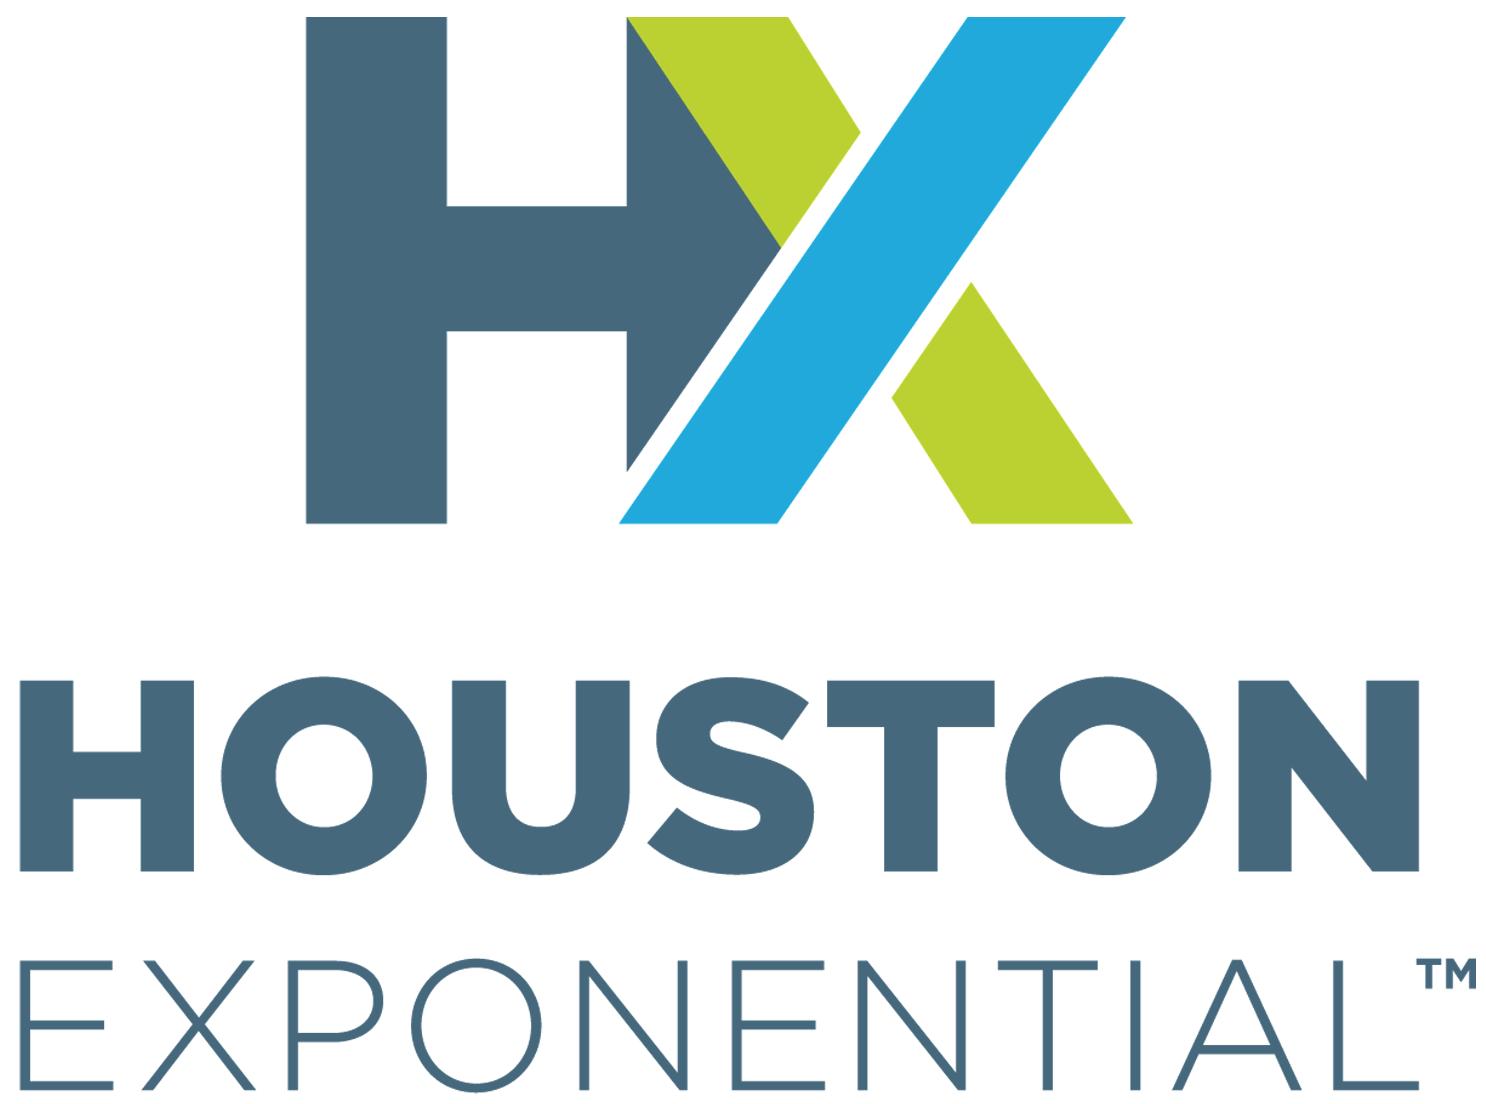 Go to Houston Exponential